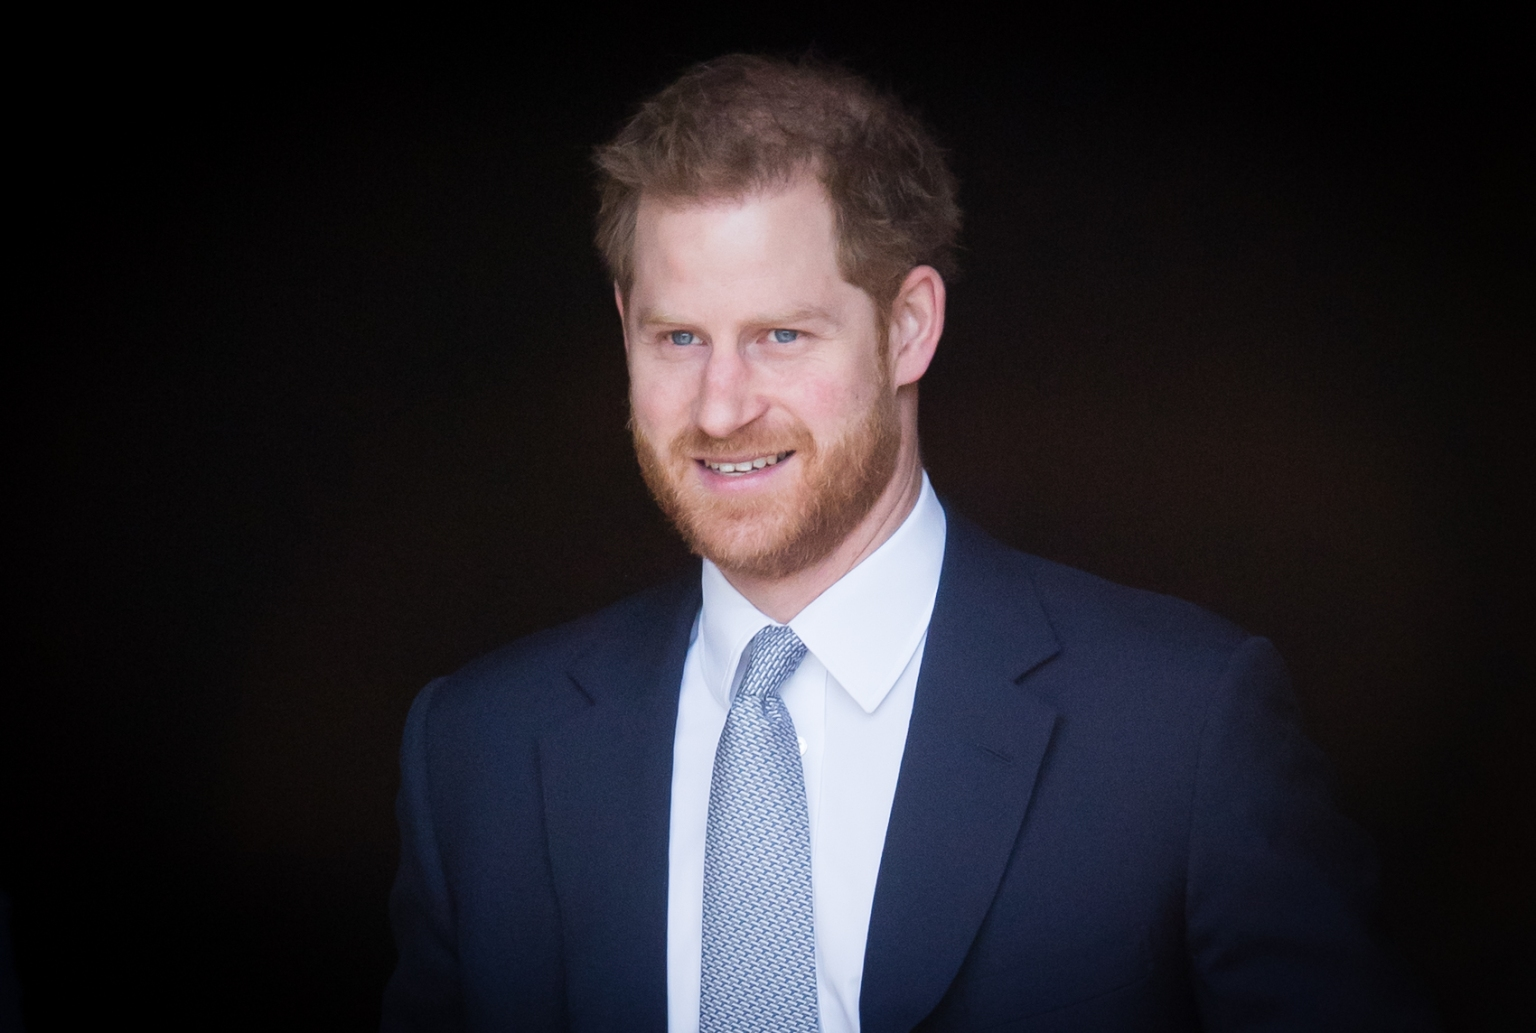 Prince Harry lands new job as a tech executive